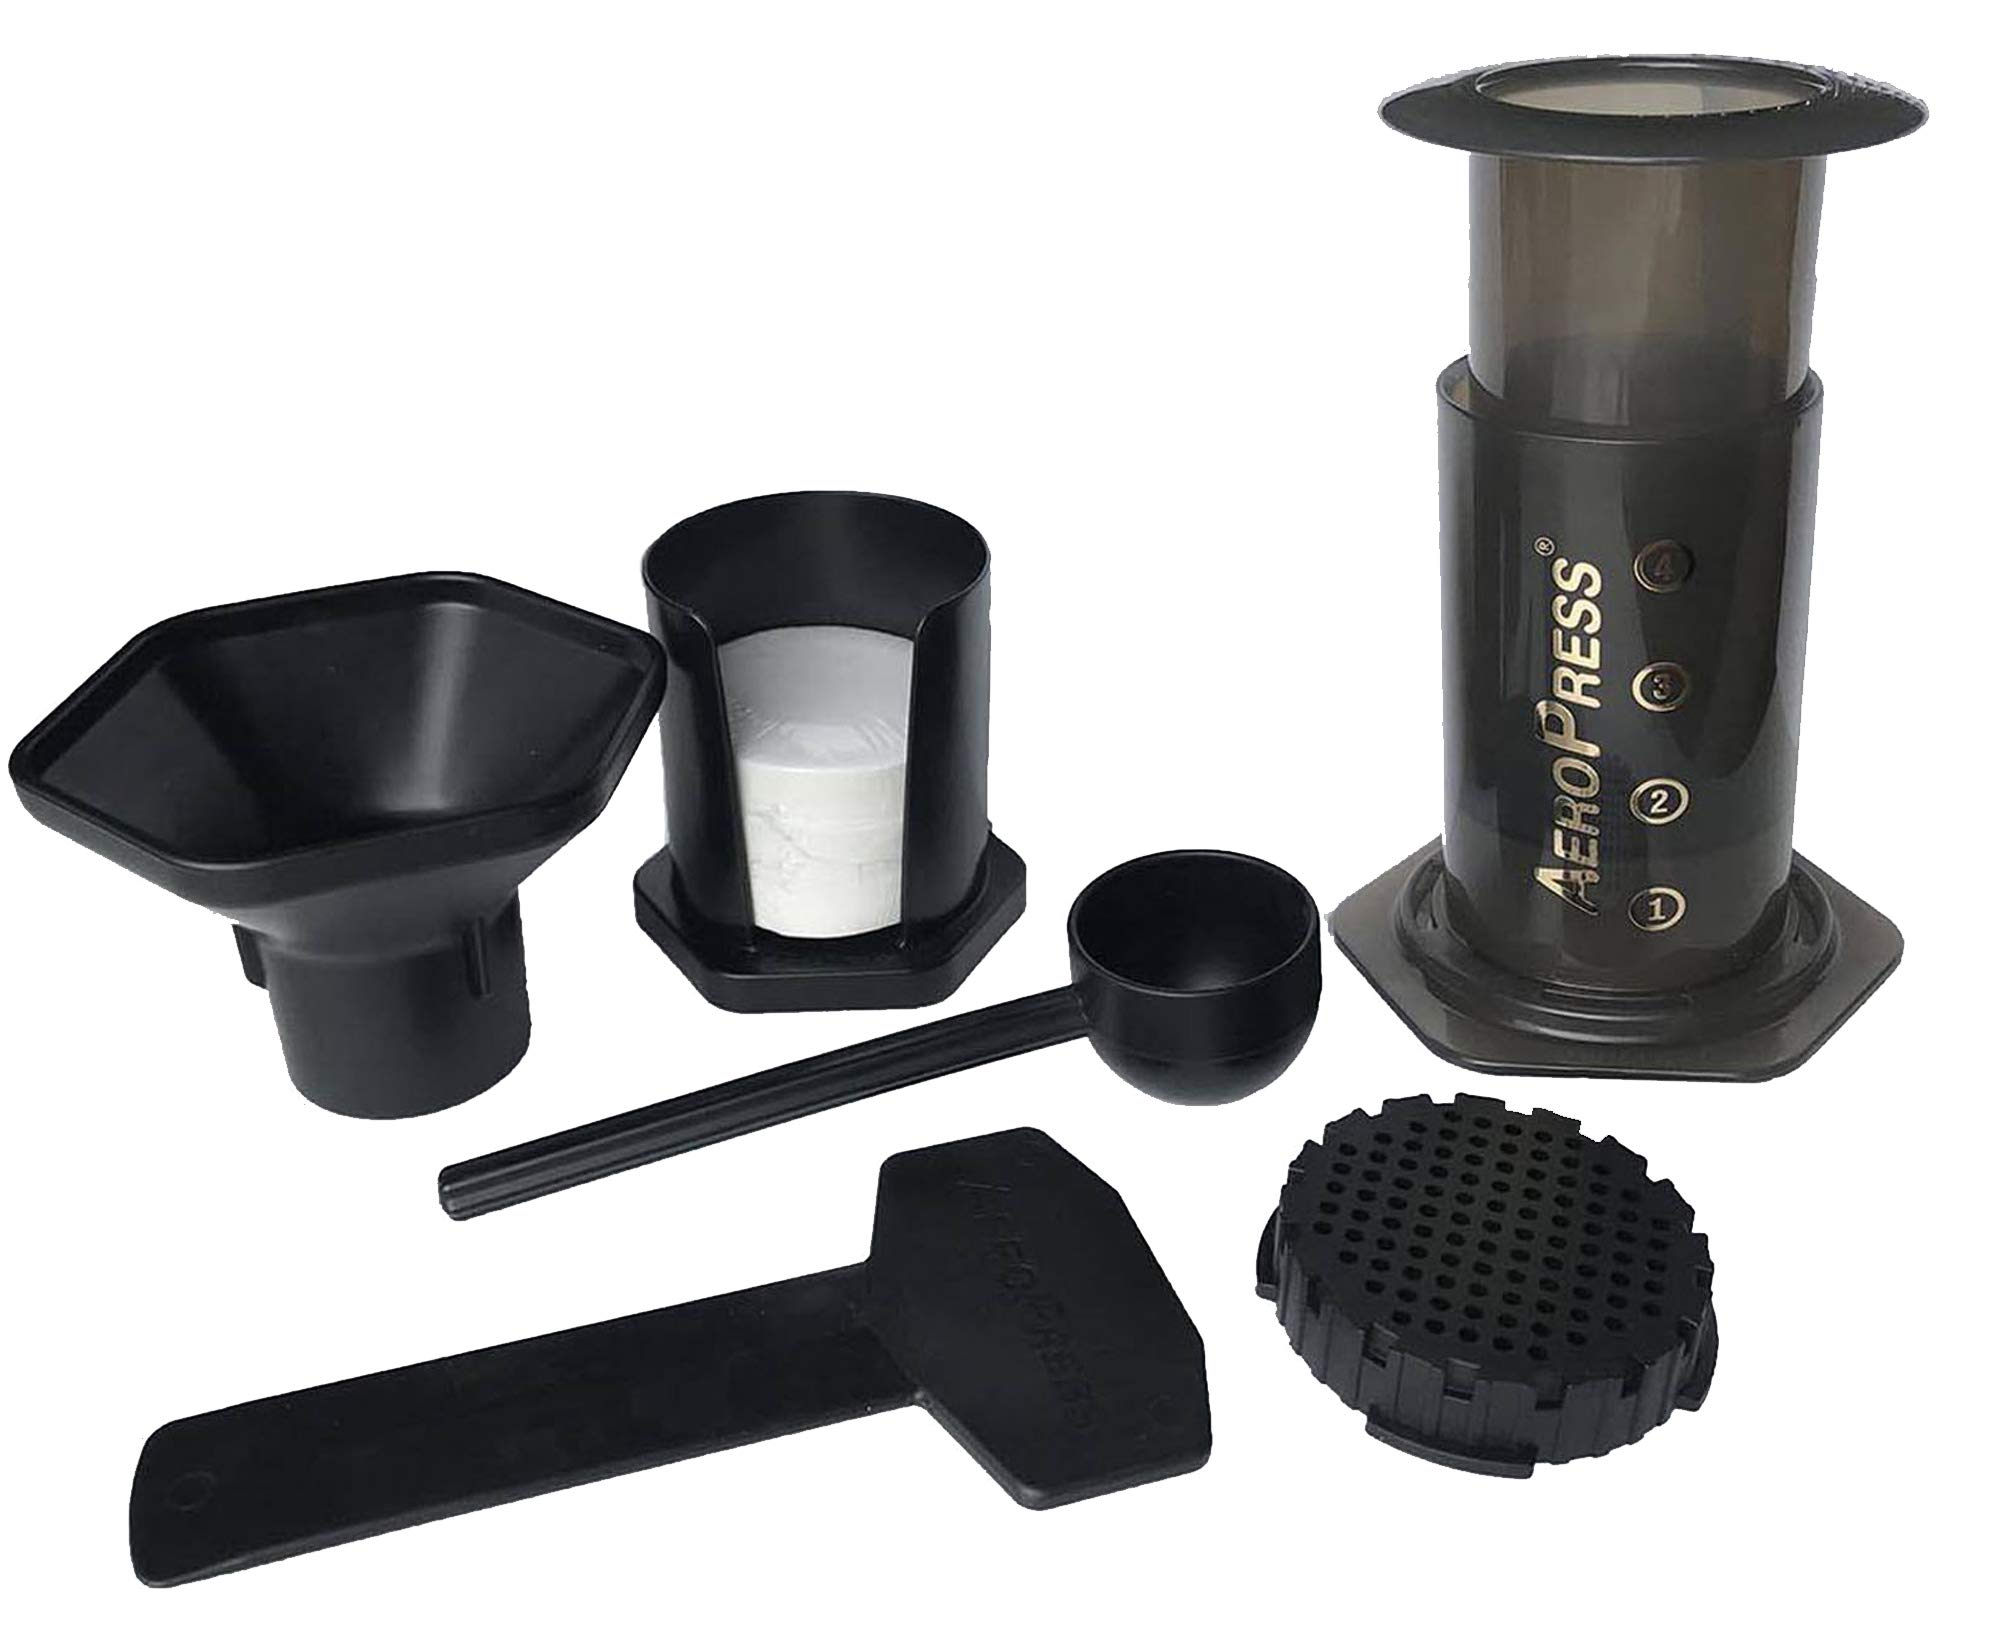 Aerobie AeroPress A80 Coffee Maker – Black